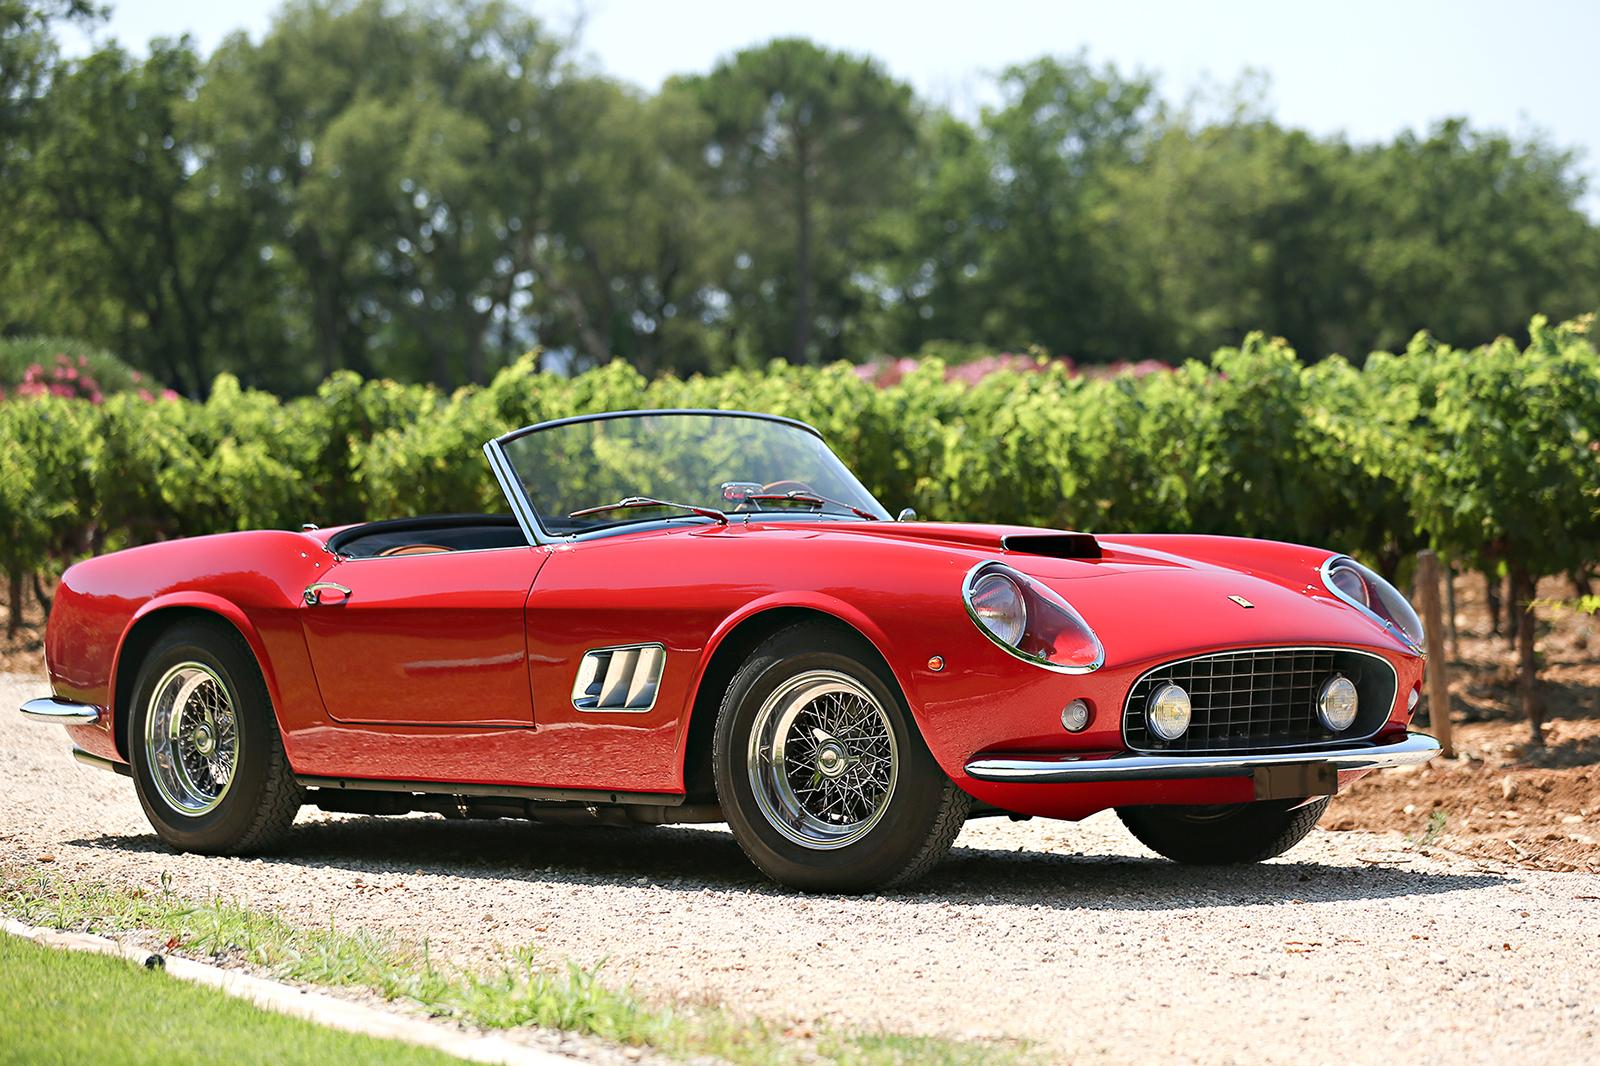 The 13 Most Expensive Cars Ever Sold Autocar 1960s Jaguar 10 Ferrari 250 Gt Swb California Spider 18500000 14925370